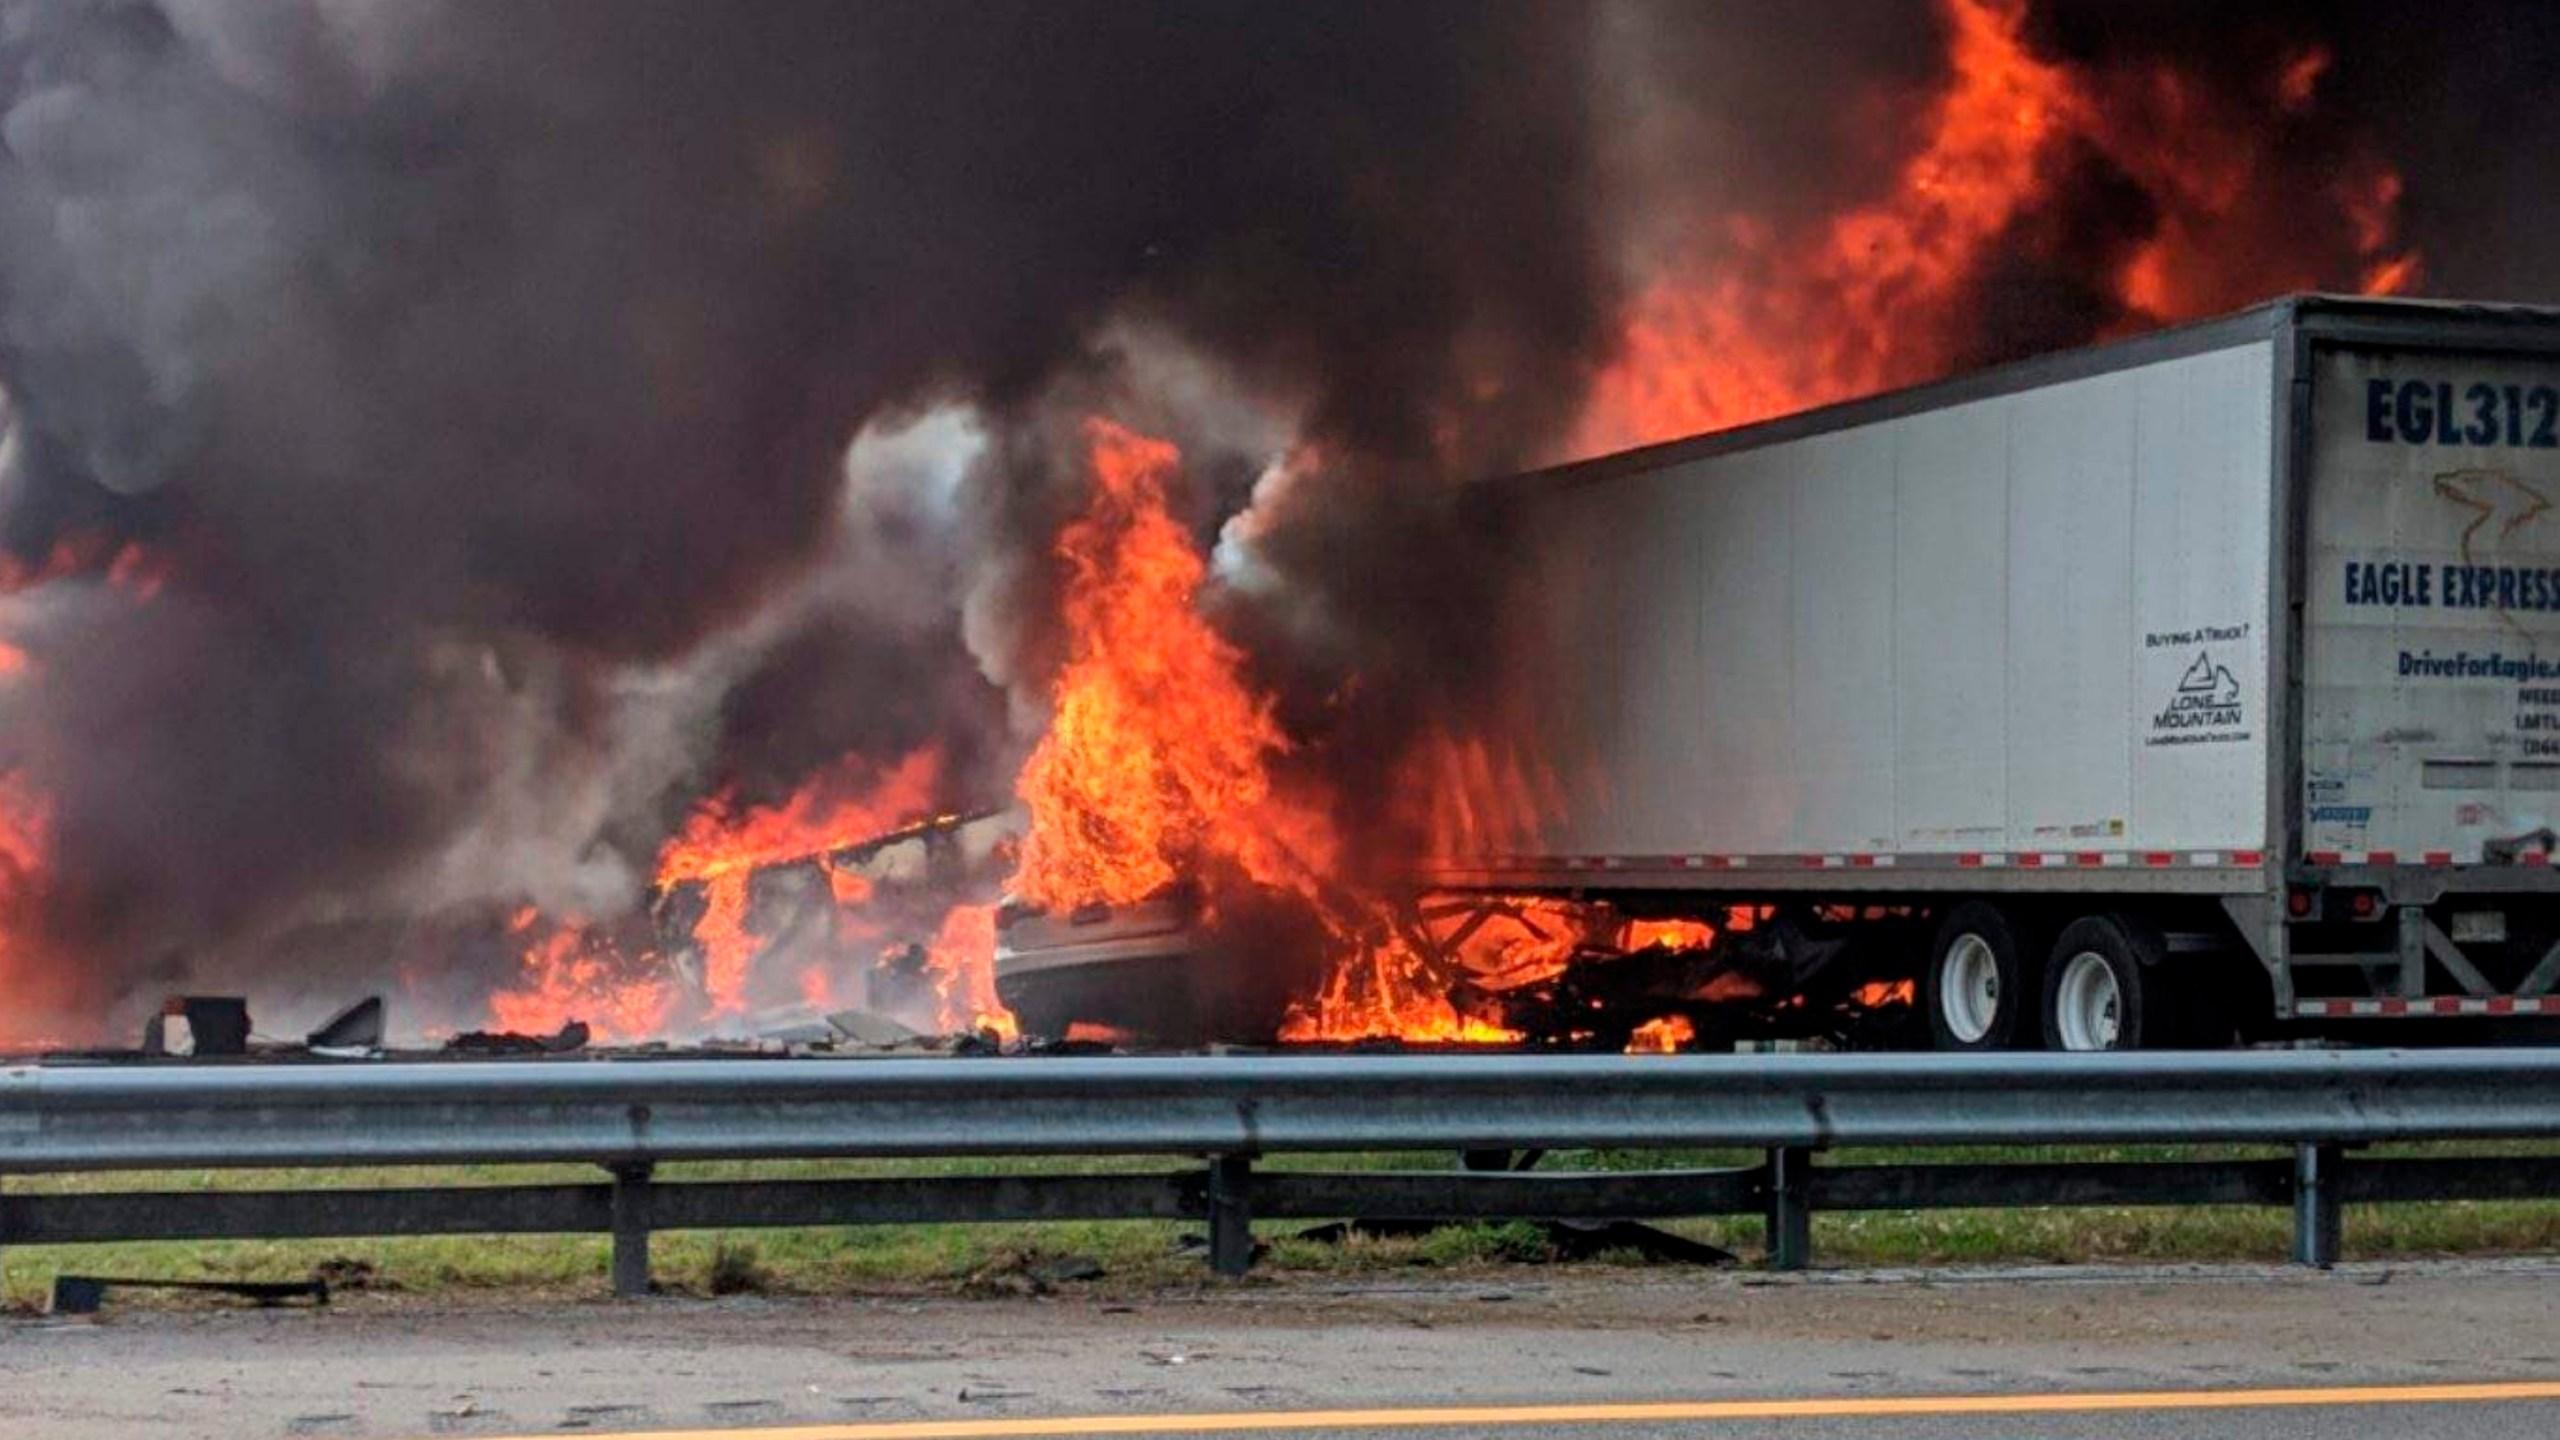 Fatal_Crash-Interstate_Fire-Florida_79055-159532.jpg17056993